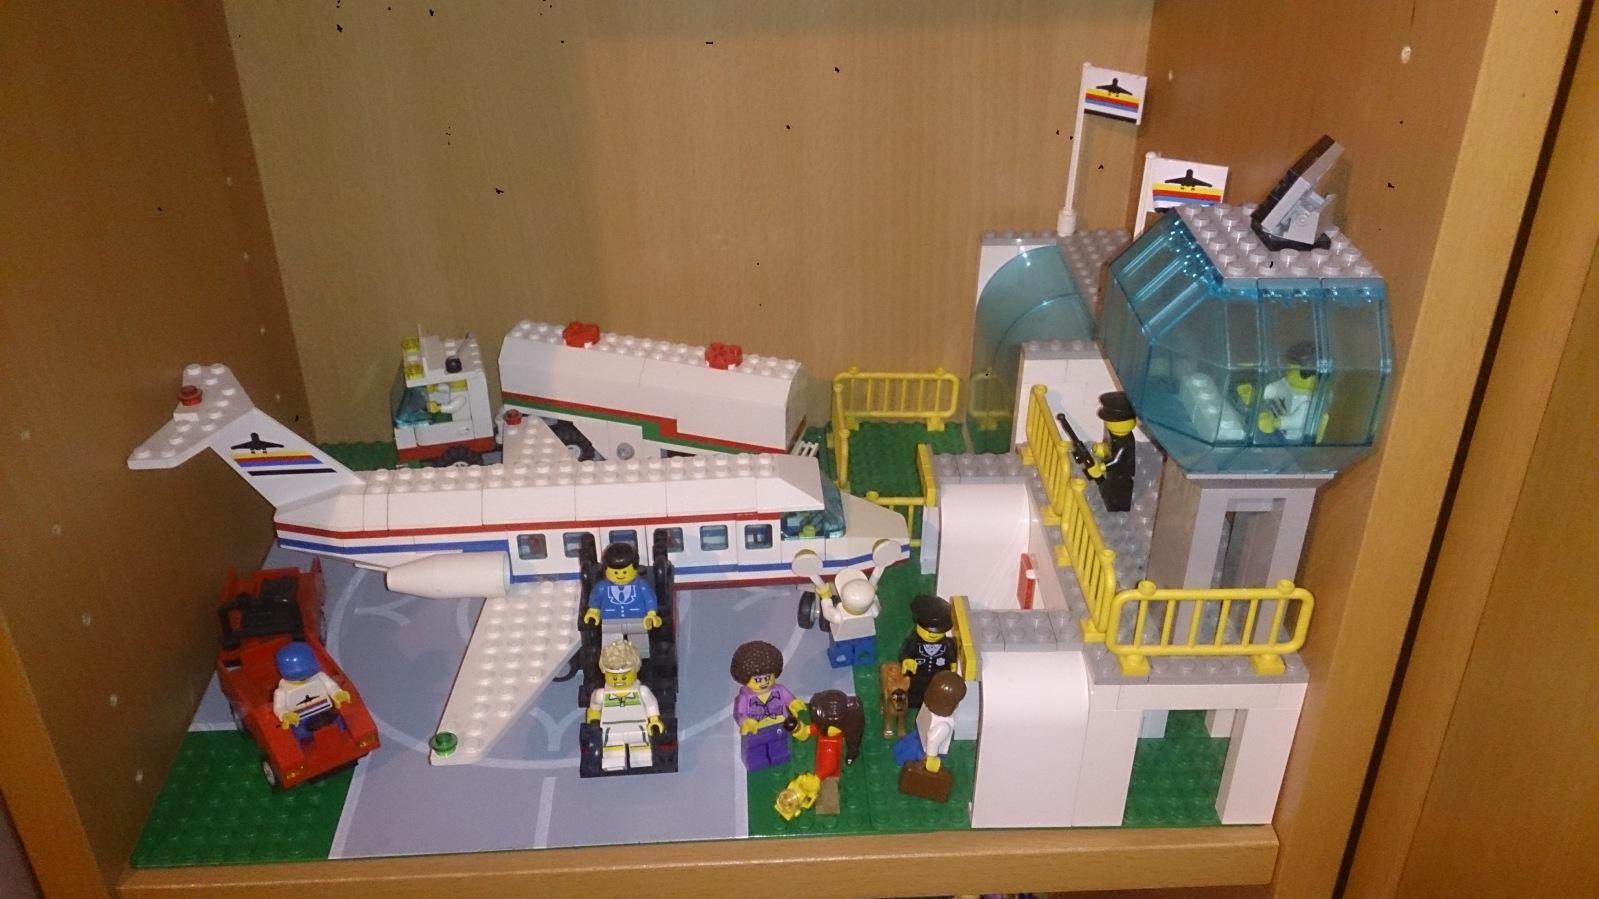 Lego Αεροπλάνα και Ελικόπτερα - Σελίδα 2 1zg88k8